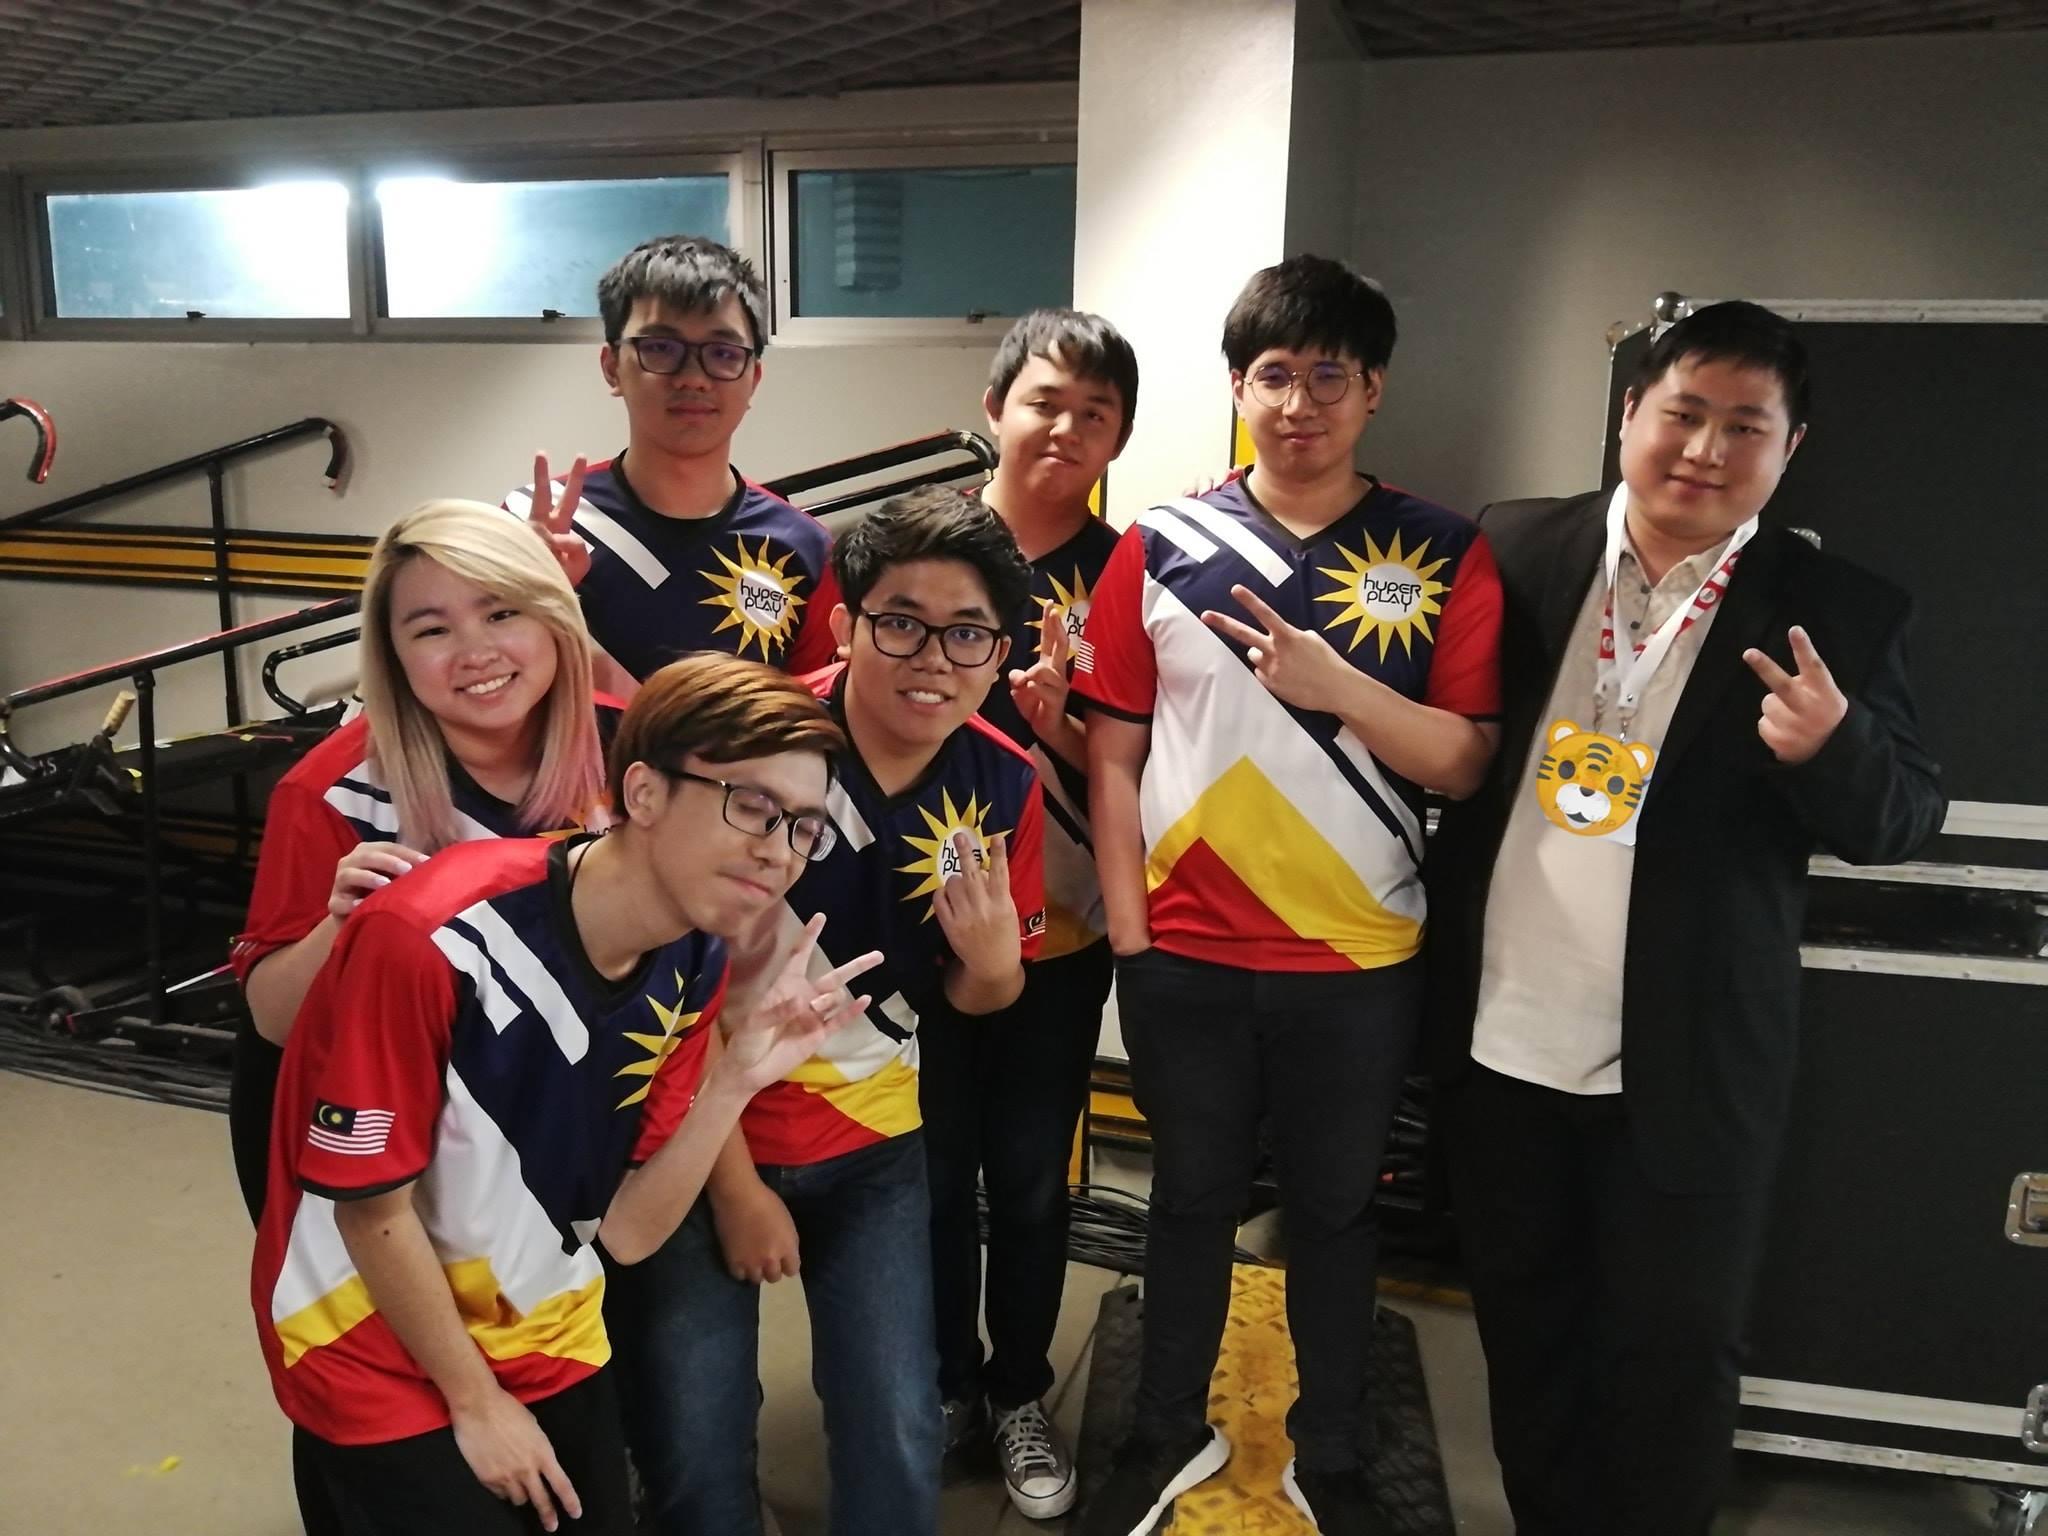 Kuala Lumpur Hunters, KL Hunters, League of Legends, eSports, LoL, Malaysia, Hyperplay